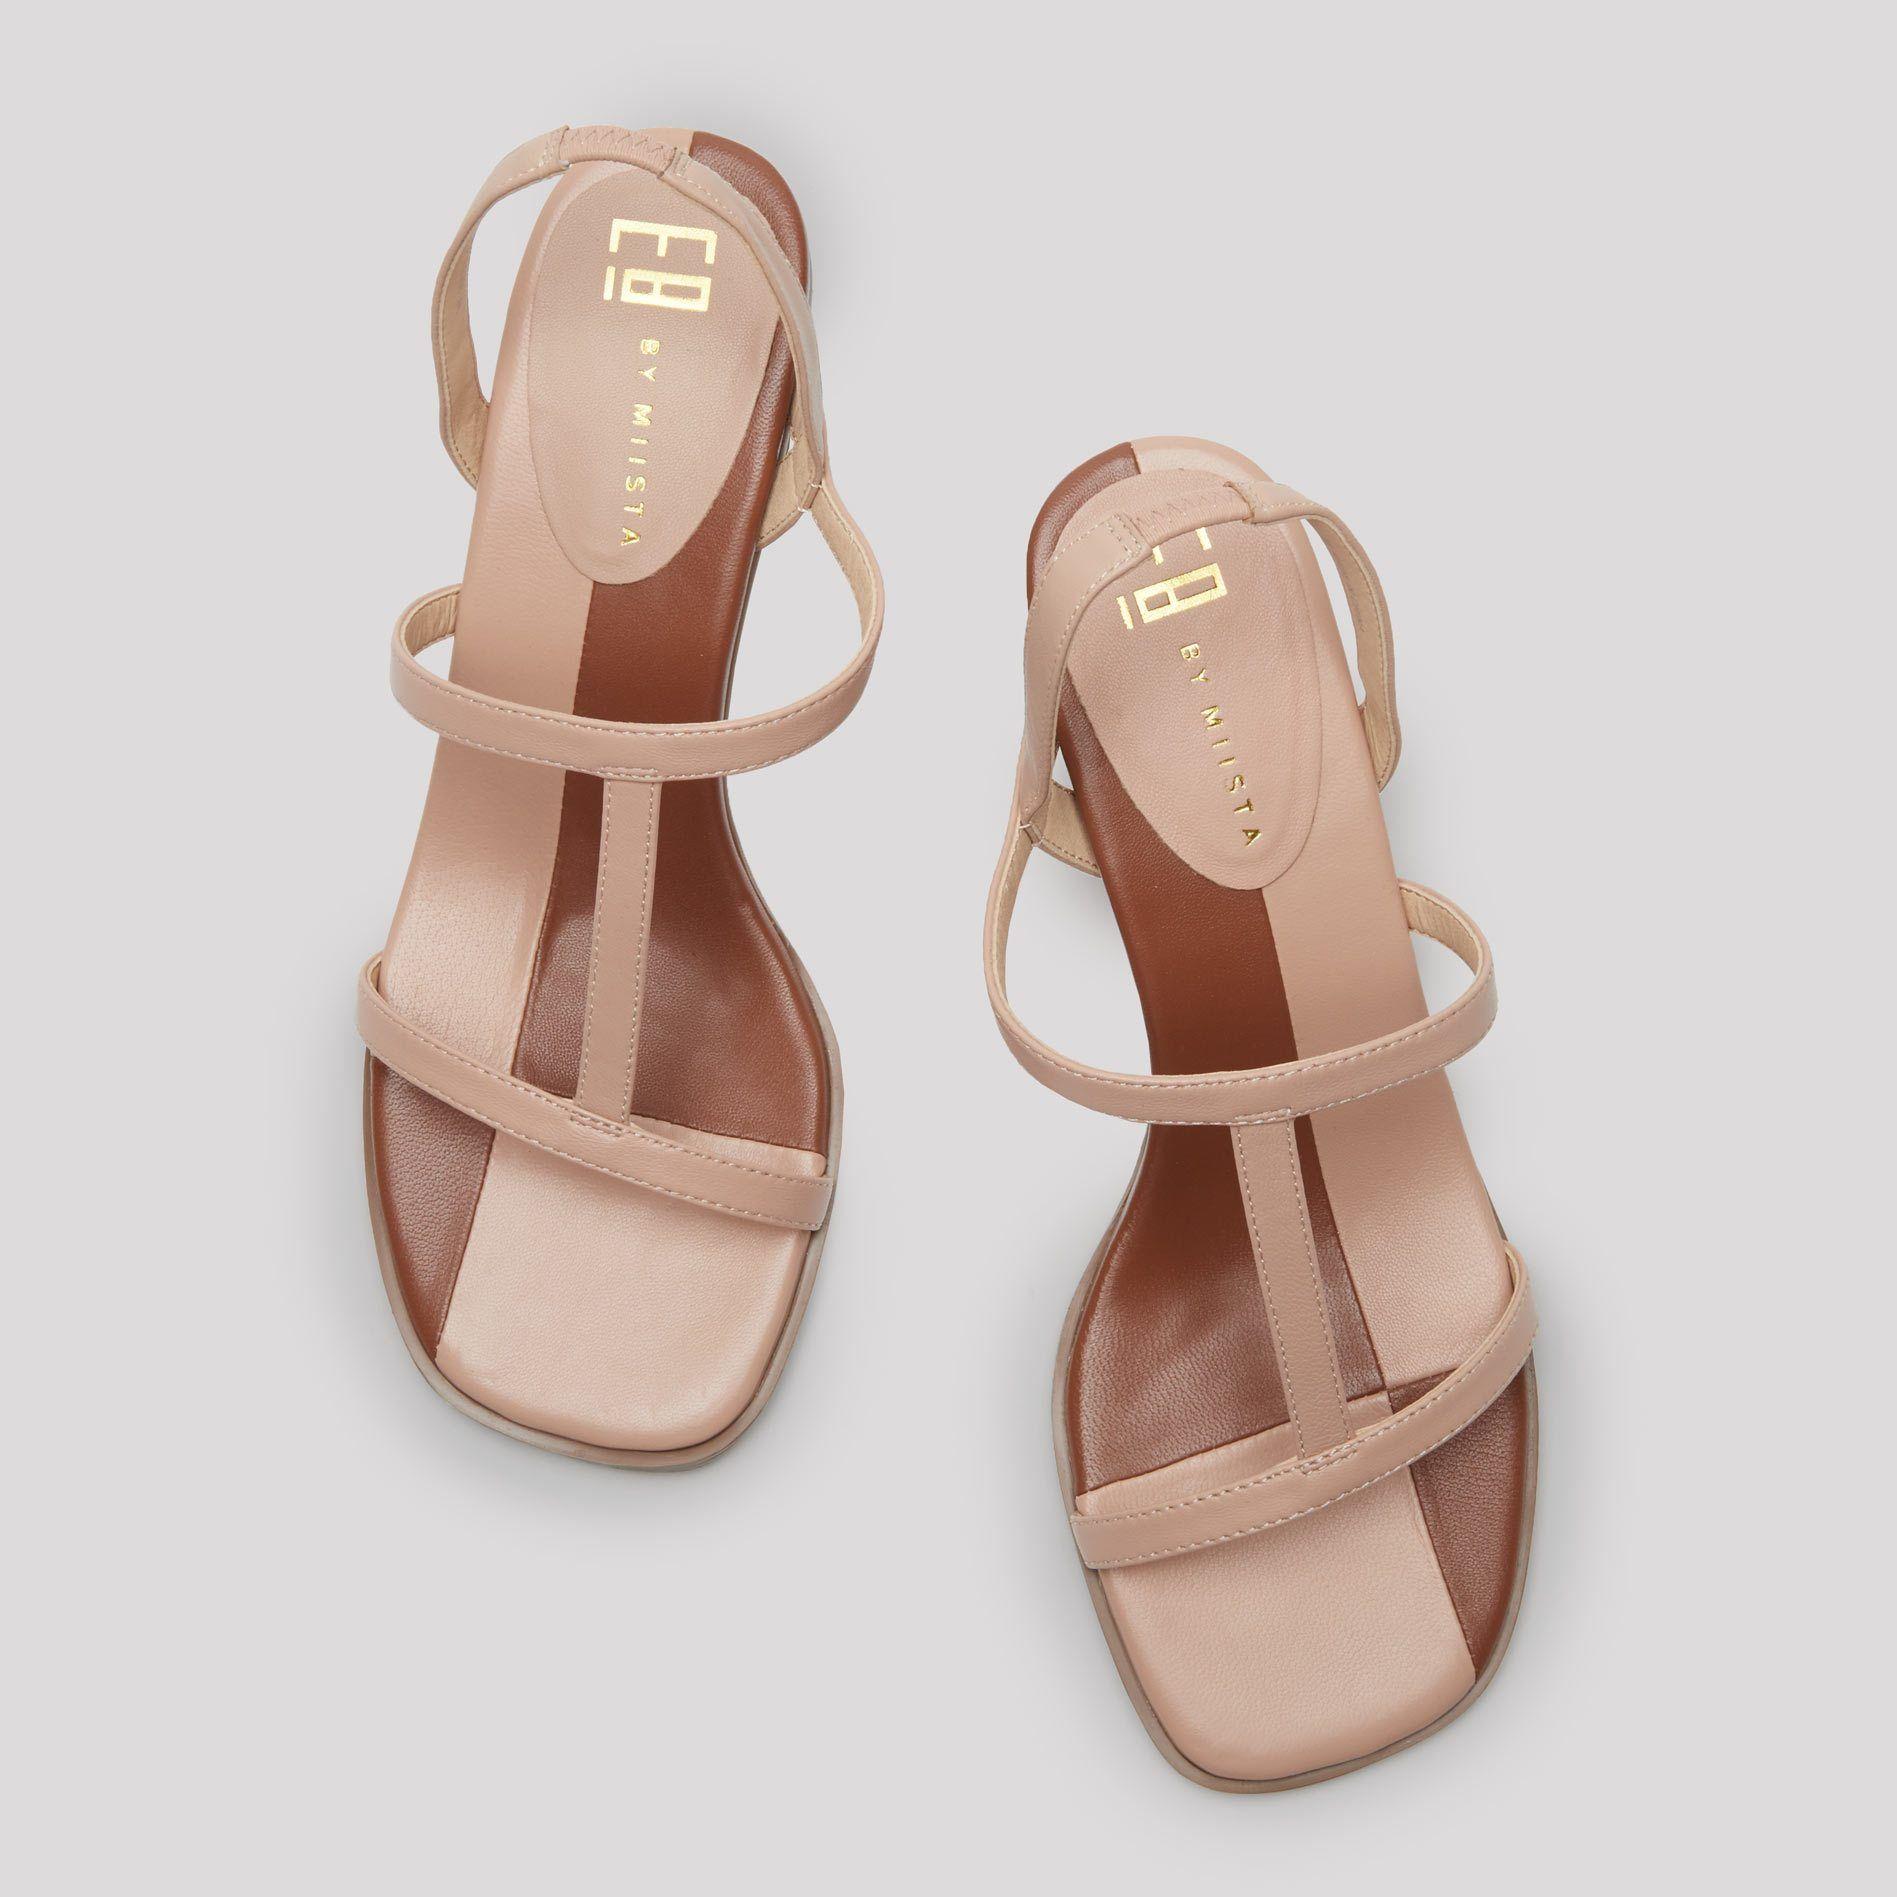 Objet Carmen 2019E8 Diffusion Blush Heels Leather Trouvé In Mid FT1lcKJ